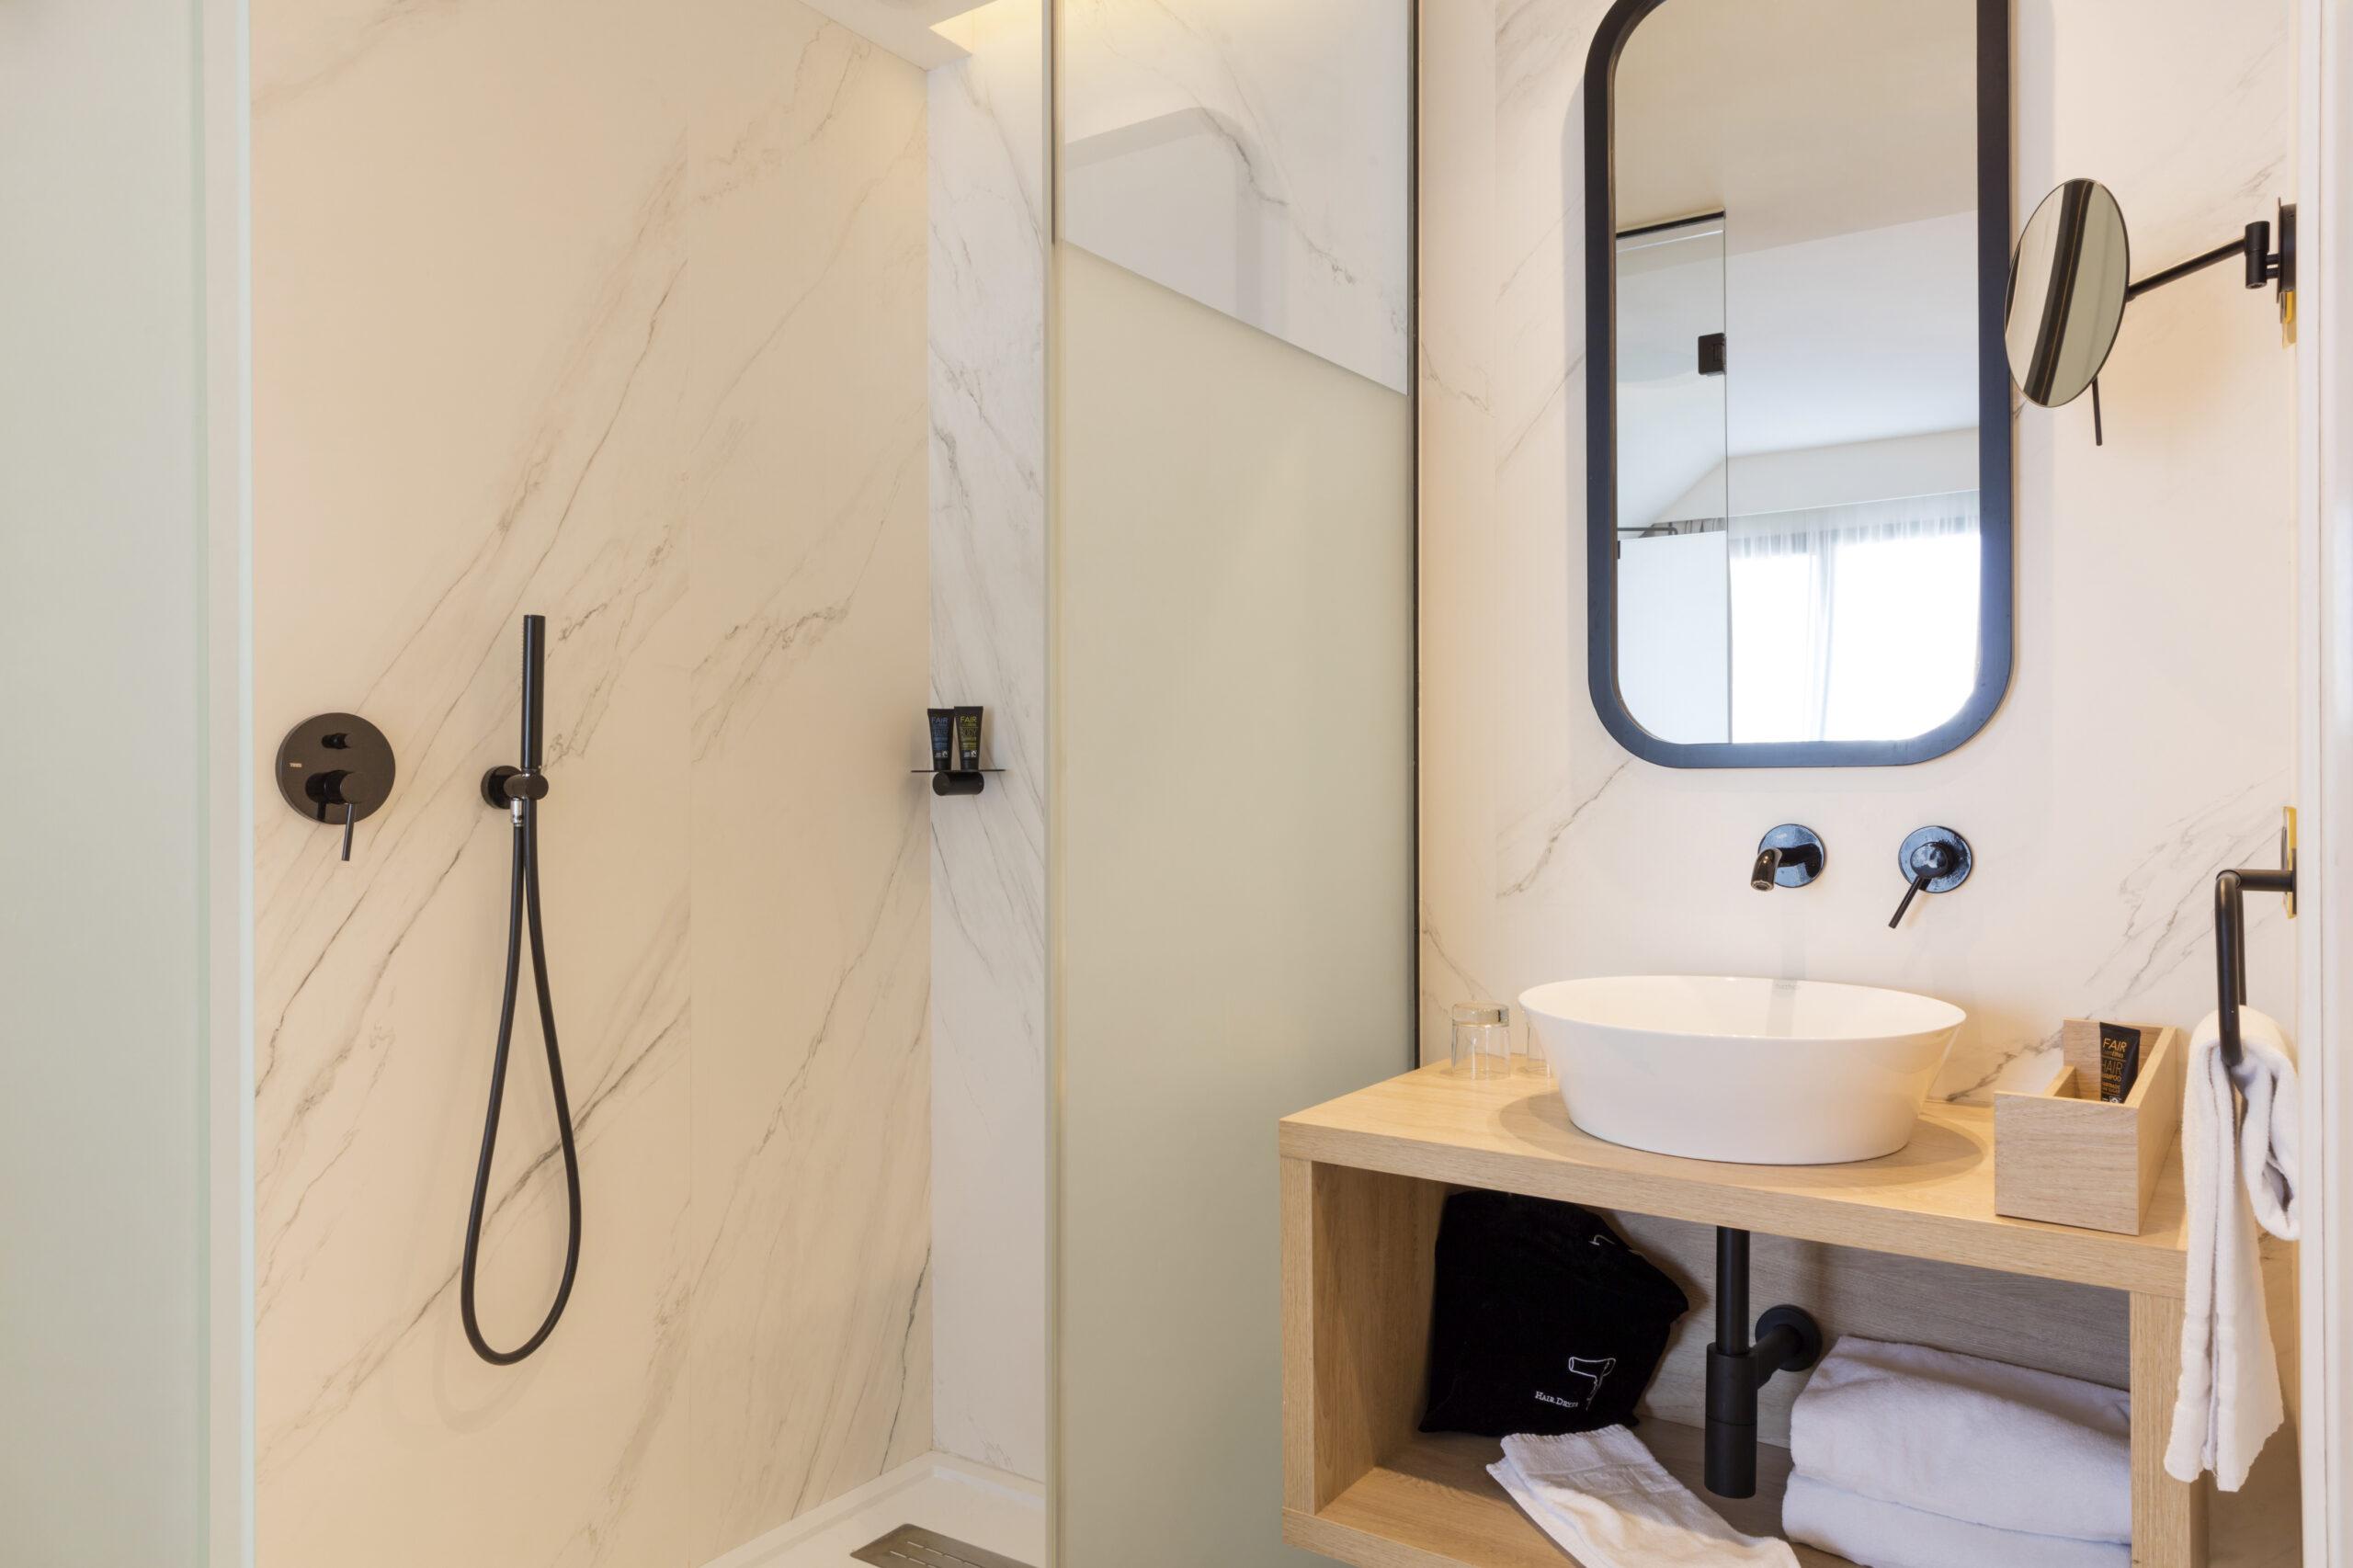 Ars Magna Bleisure Hotel - Habitación Doble Estándar - Servicios